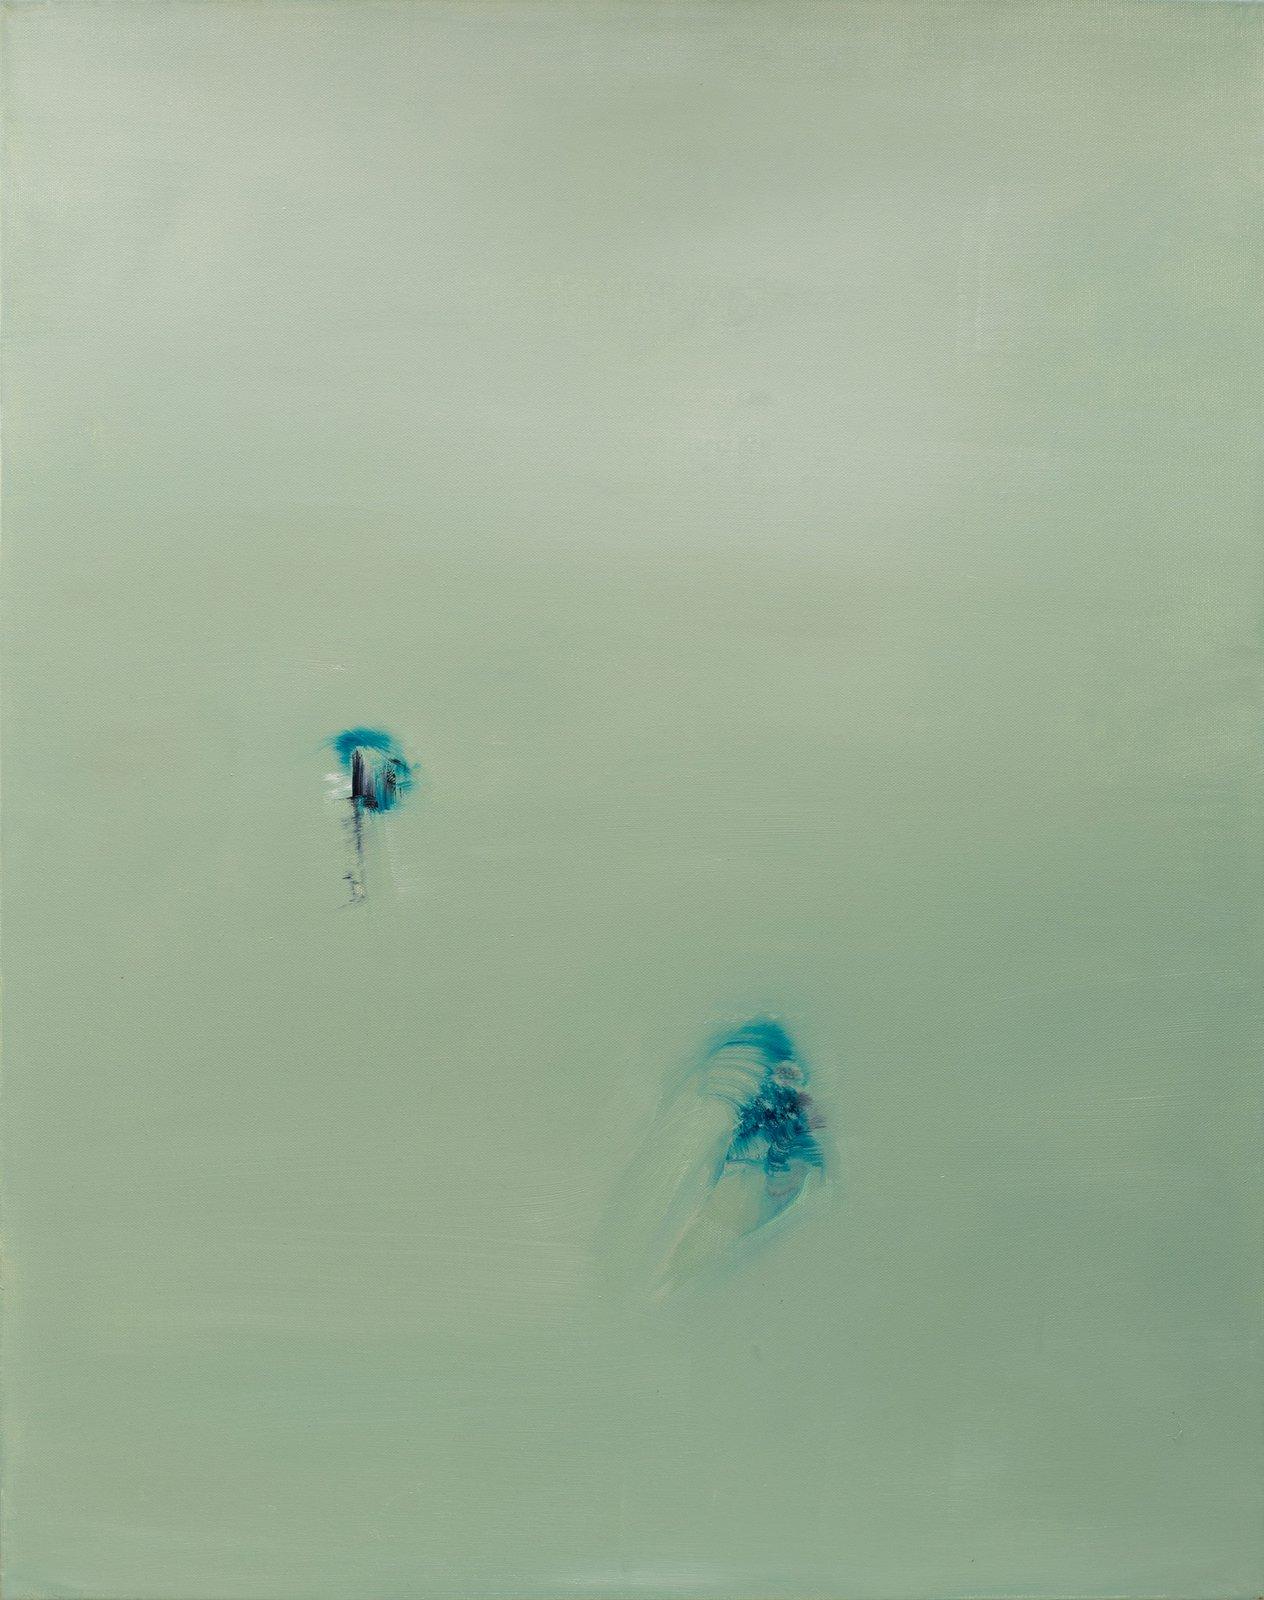 Danielle Voight The Crow's Air, 2014 [DV.17] Oil on Canvas 30 x 24 in.